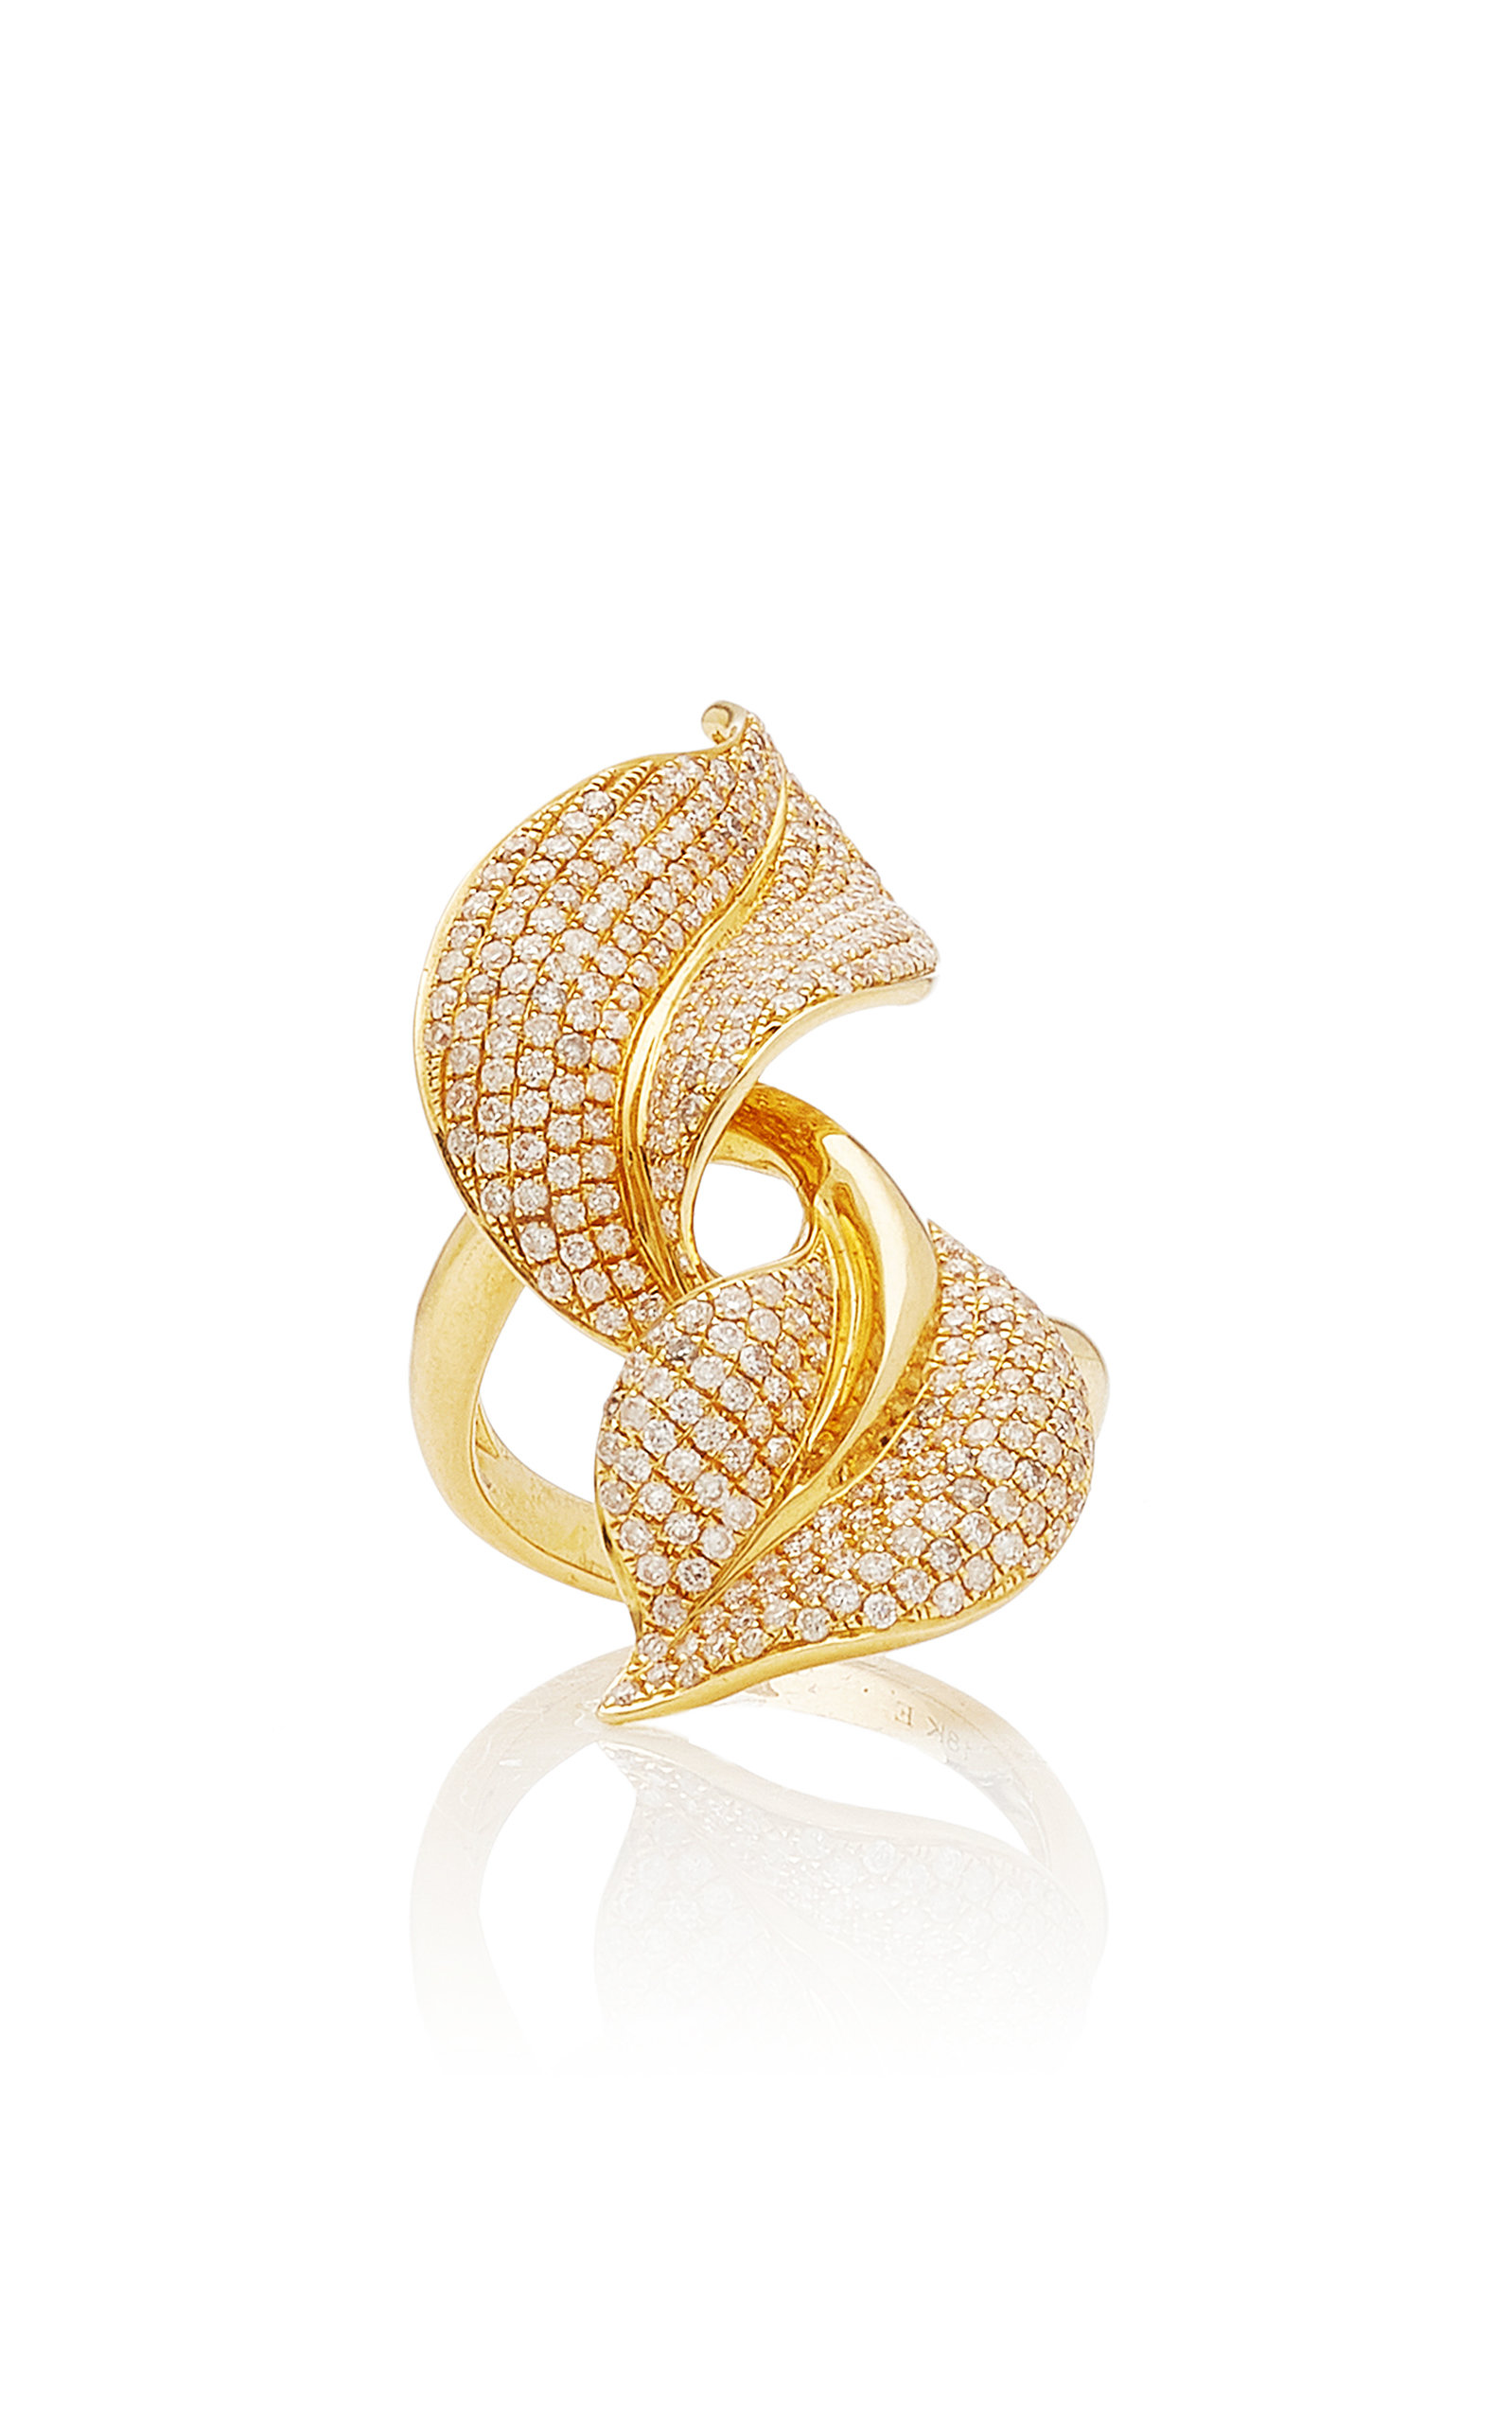 Women's Spring 18K Yellow-Gold and White Diamond Ring